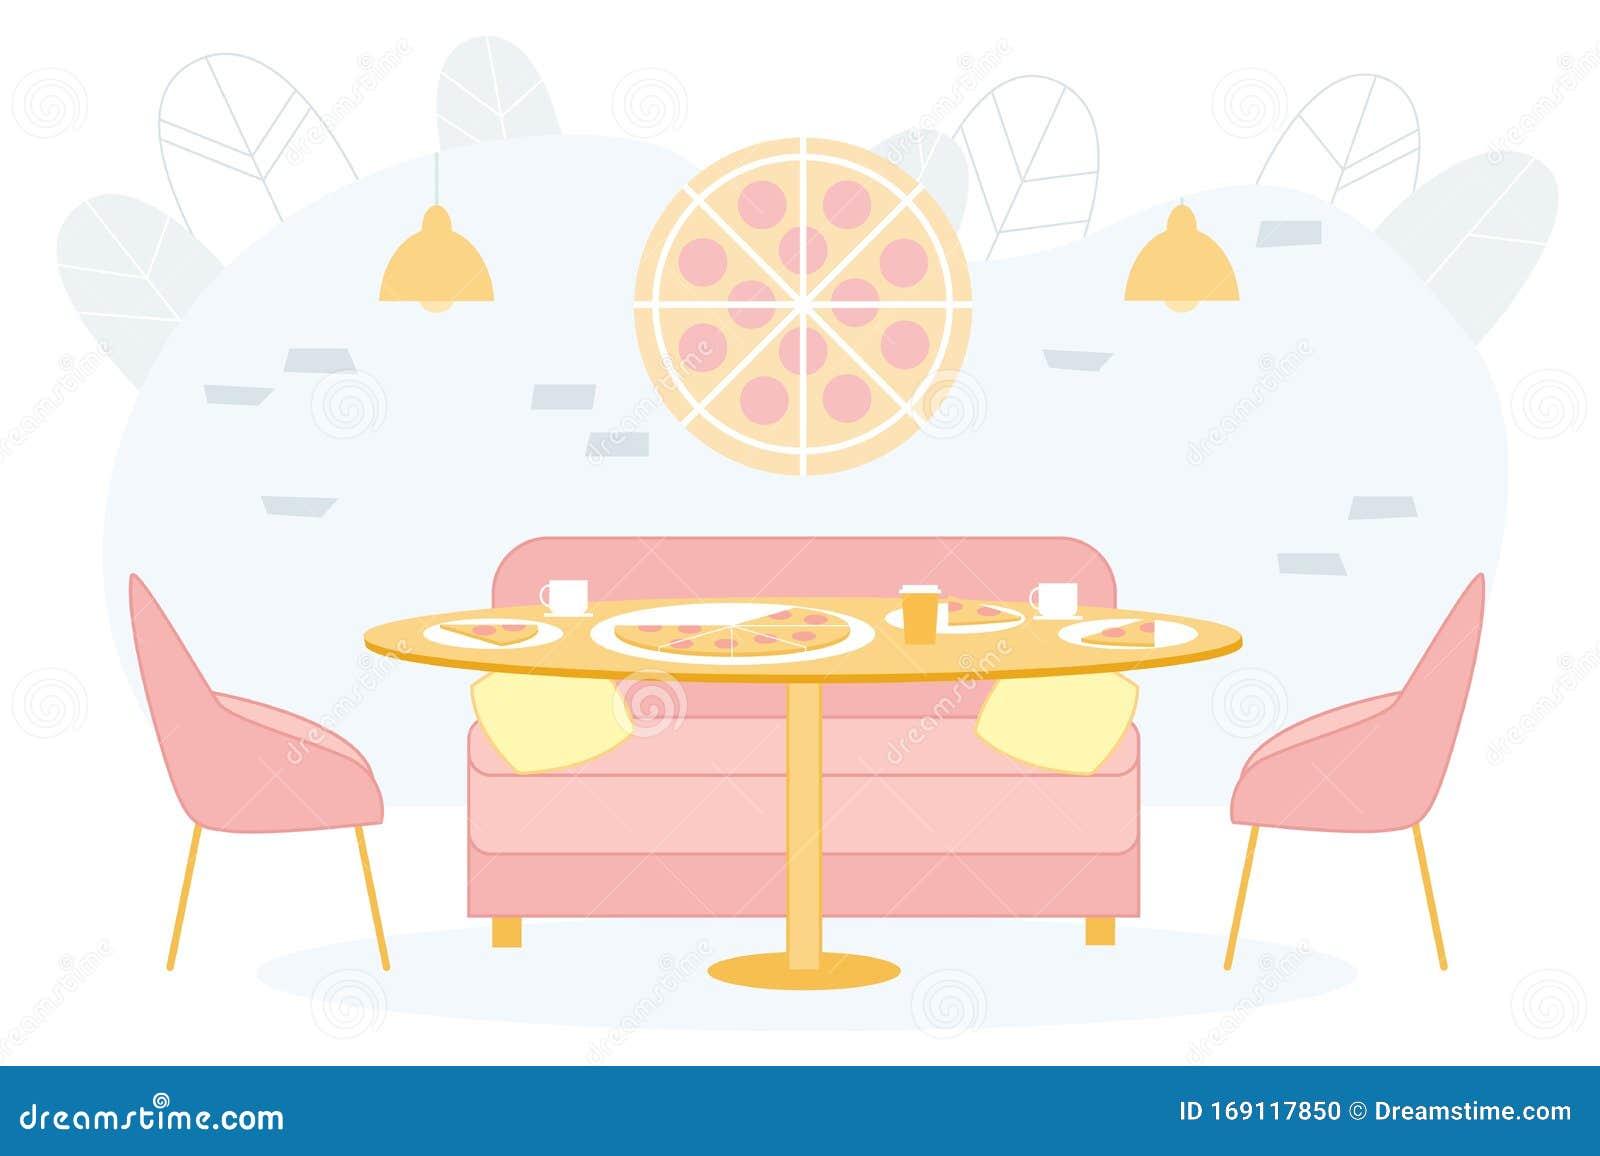 Bright Banner Trendy Pizzeria Interior Cartoon Stock Illustration Illustration Of Architecture Concept 169117850